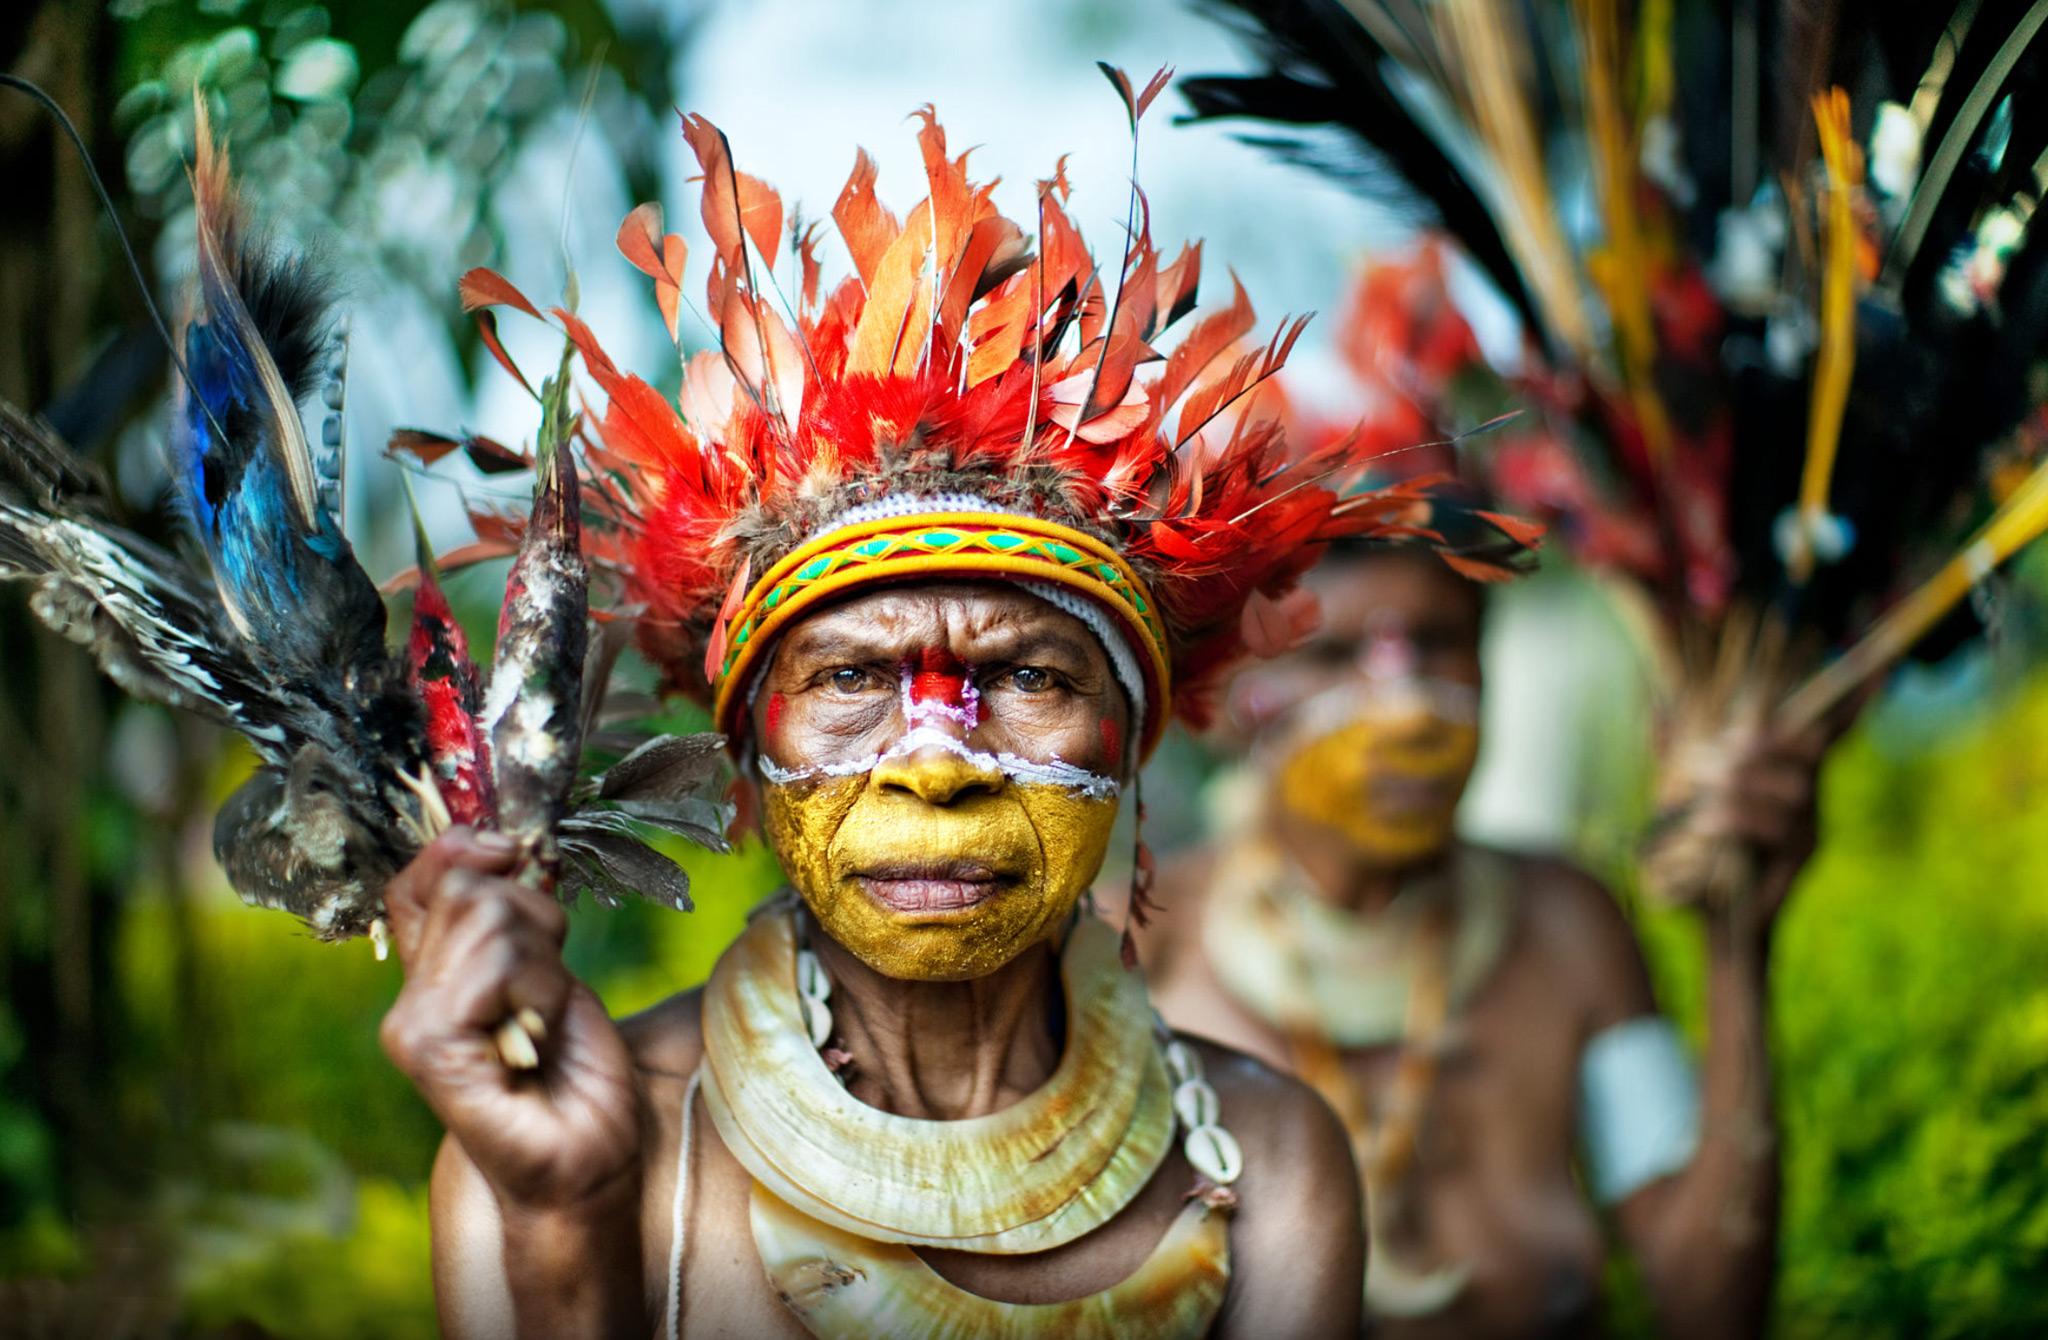 Голые племена видео  Эротикаорг